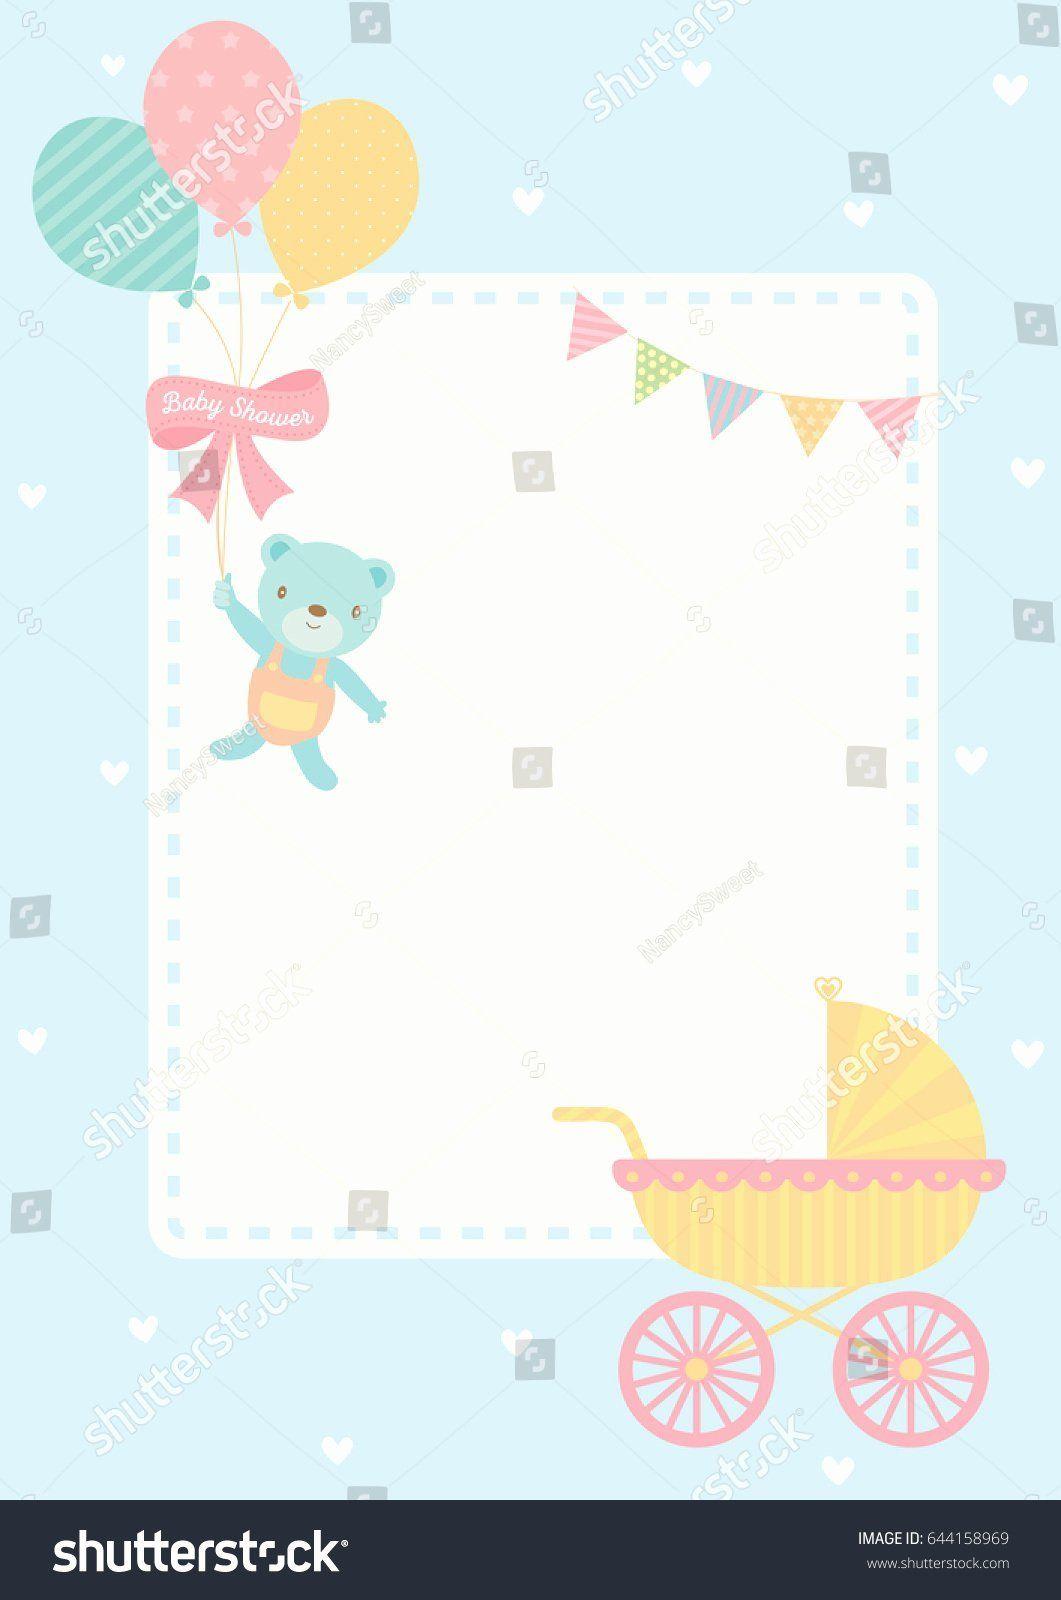 Bridal Shower Card Messages Elegant Baby Shower Greeting Card Template Teriz Yasamayolver Baby Shower Card Message Bridal Shower Cards Baby Birthday Card